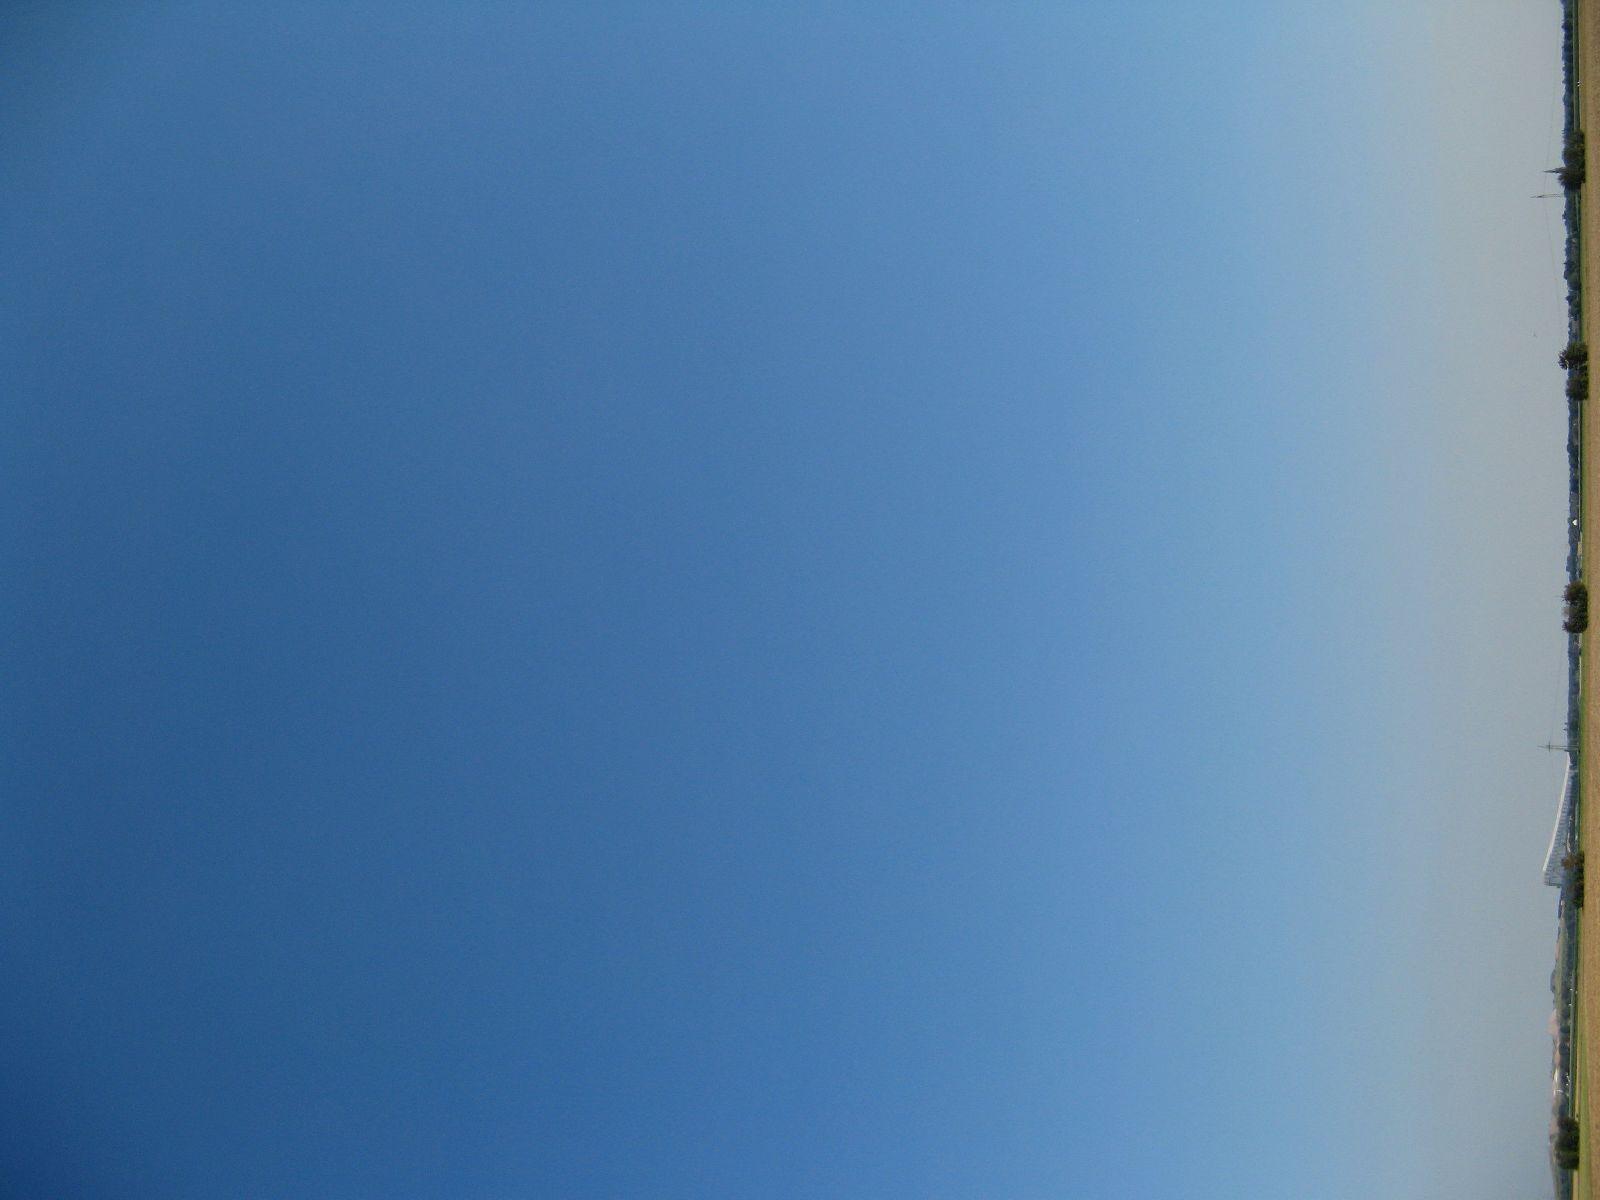 Himmel-Wolken-Foto_Textur_B_1184